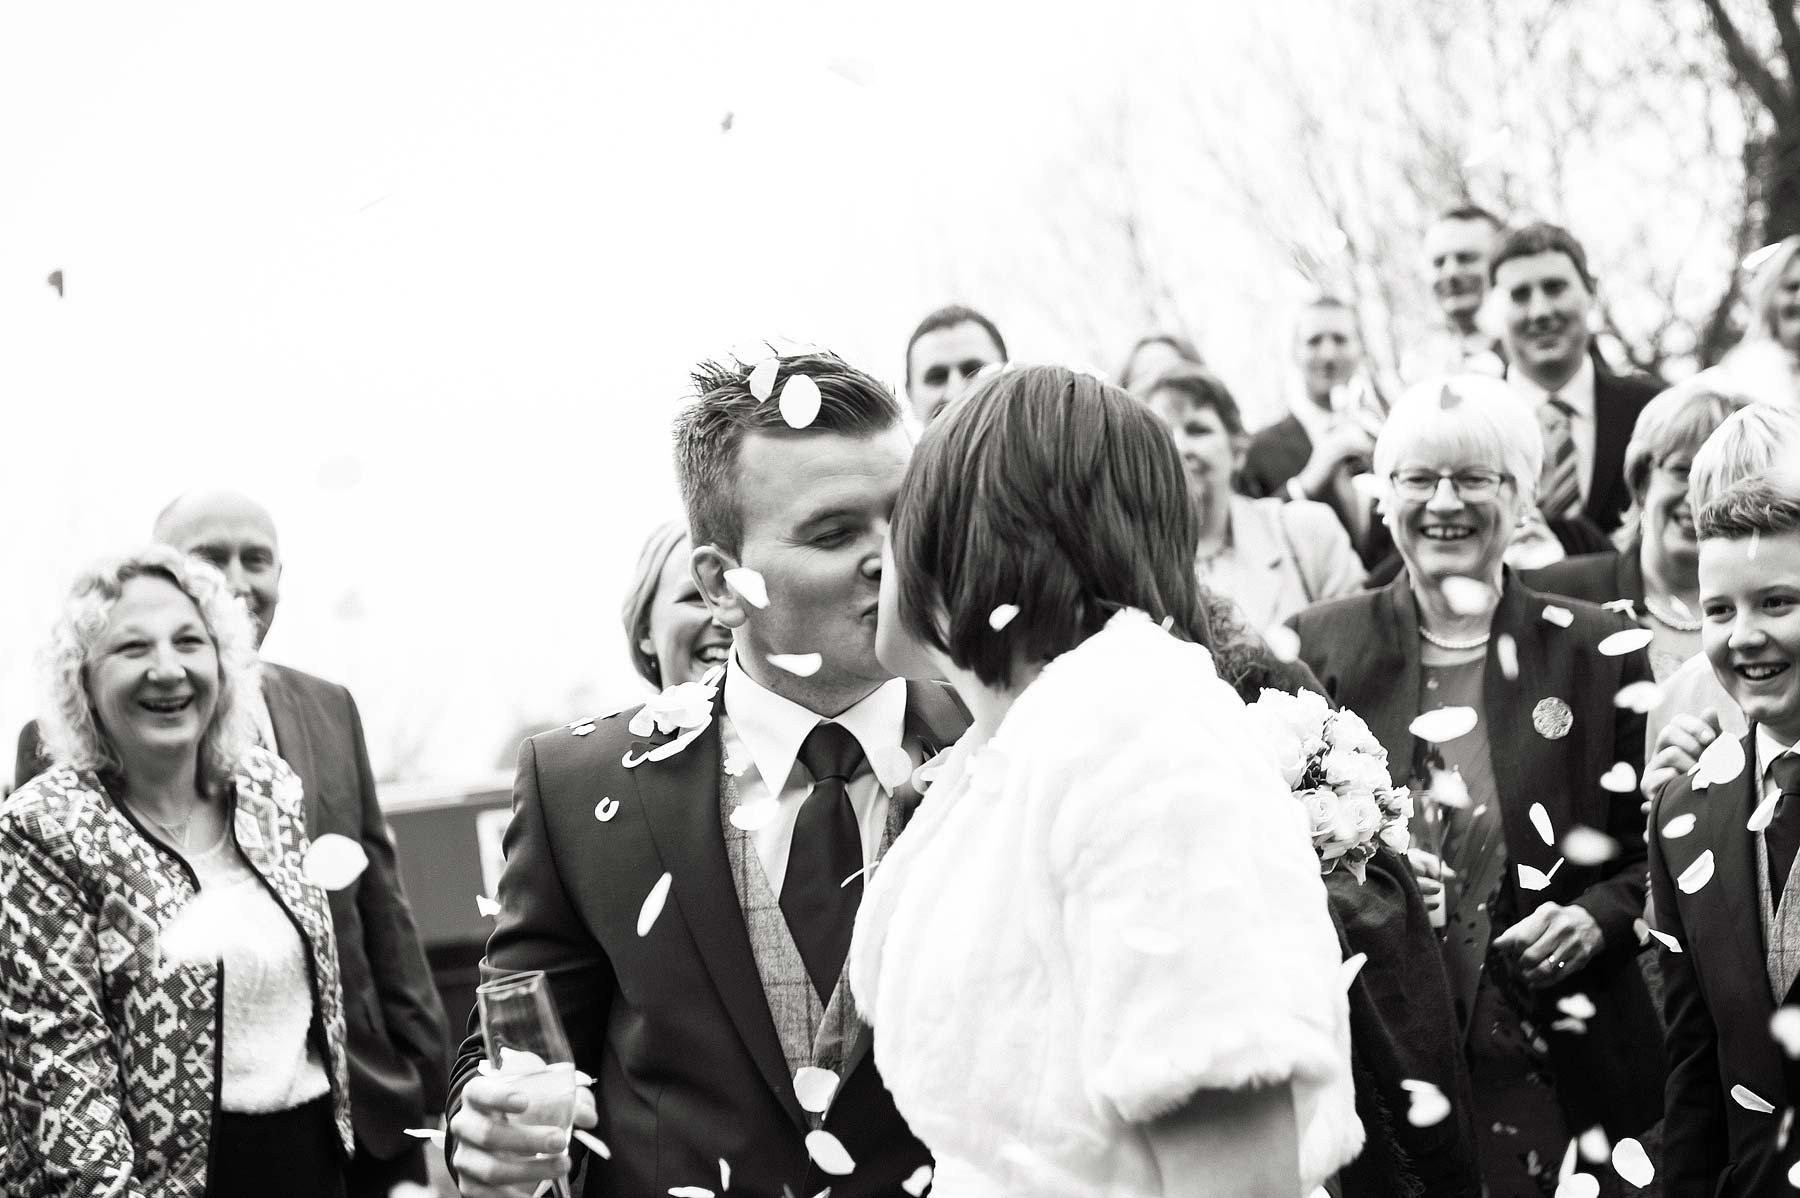 moat-house-winter-wedding-photography-049